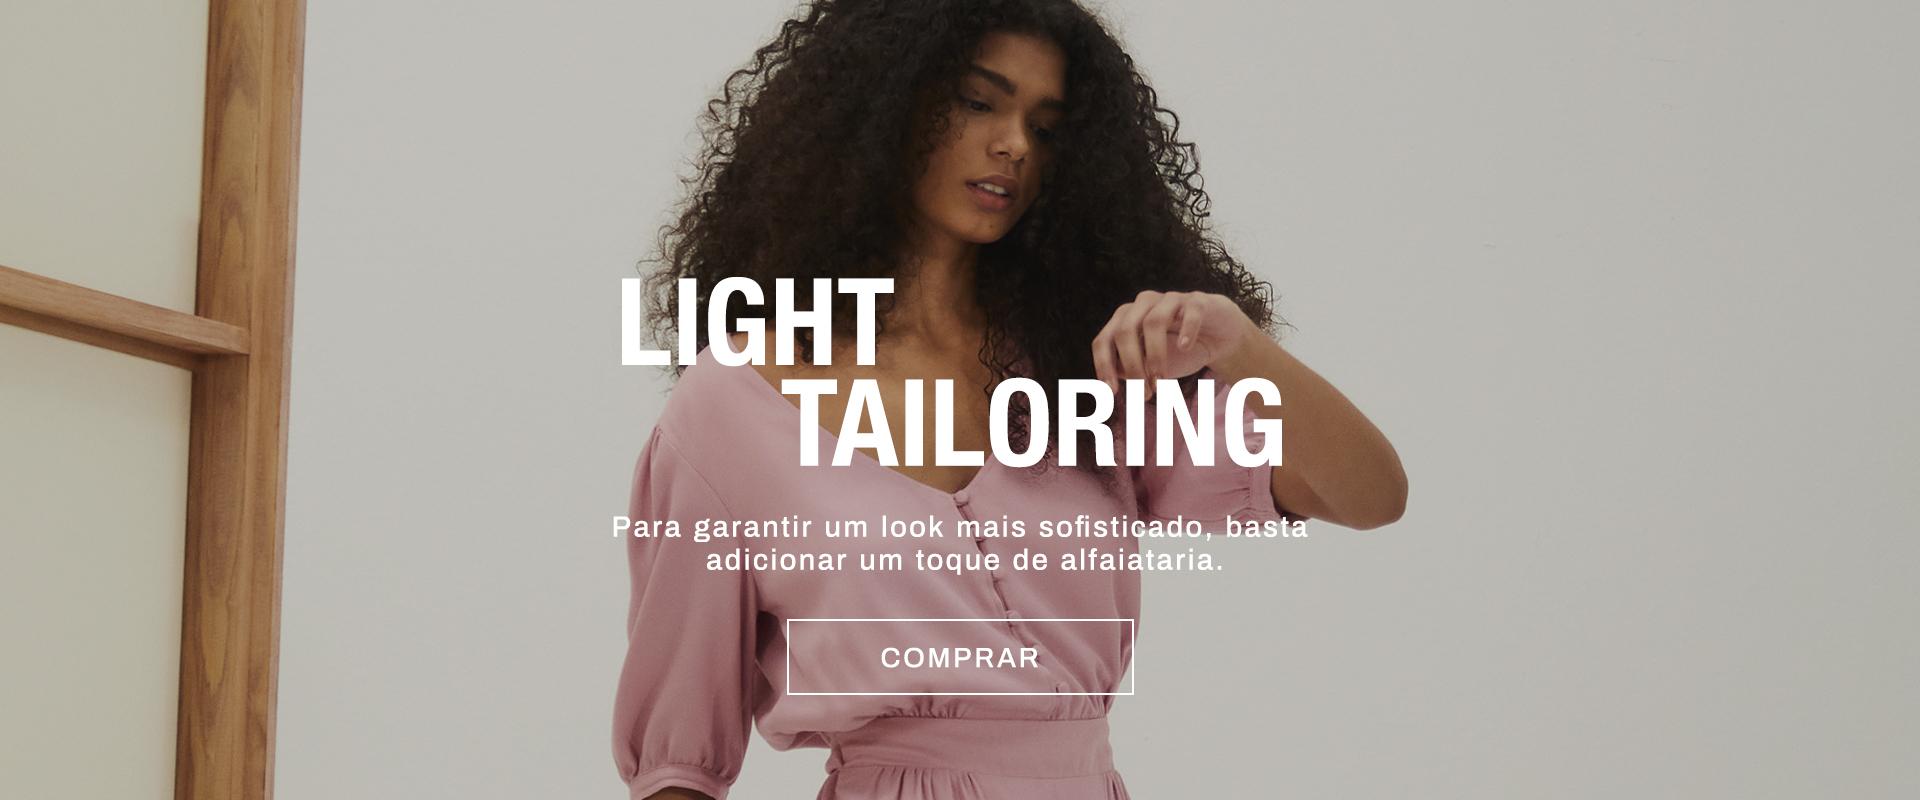 Light Tailoring - Light Tailoring